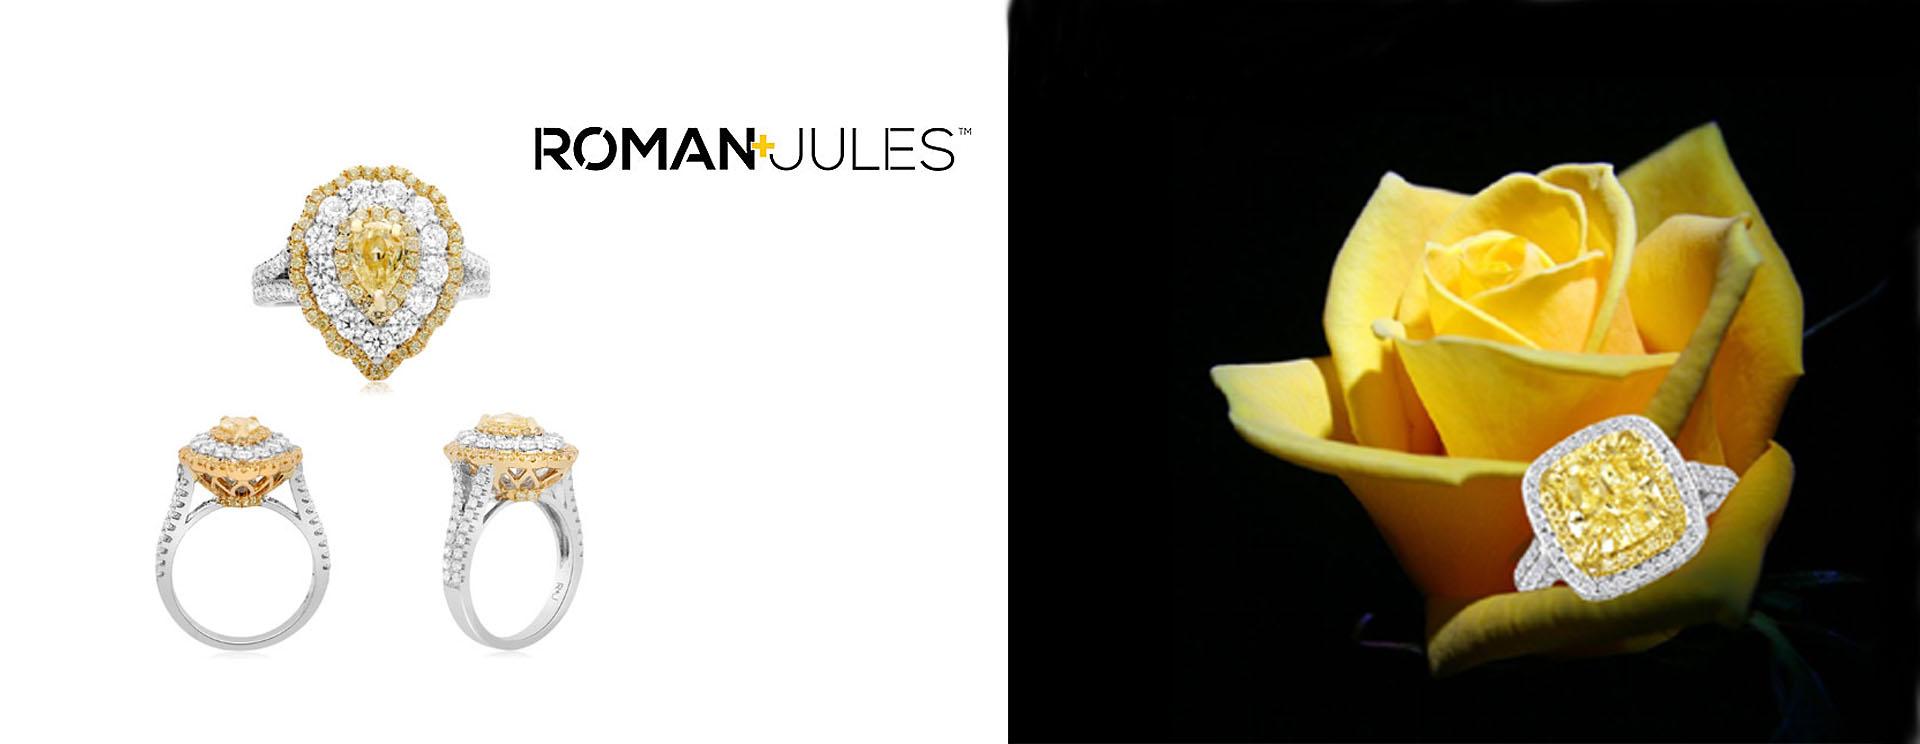 Roman Jules Jewelry